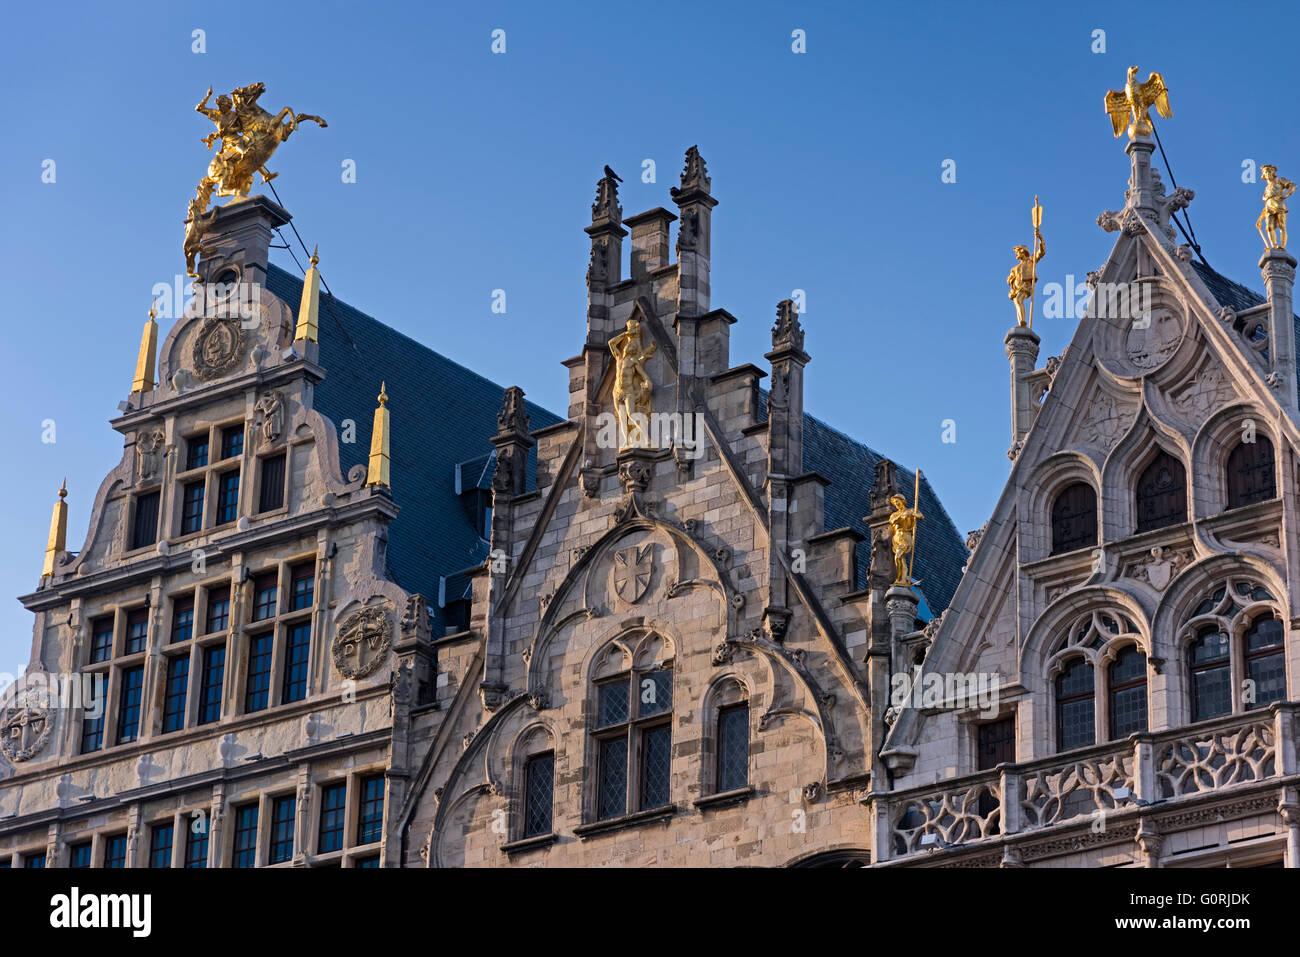 Guildhouses on the Grote Markt Antwerp Belgium Stock Photo